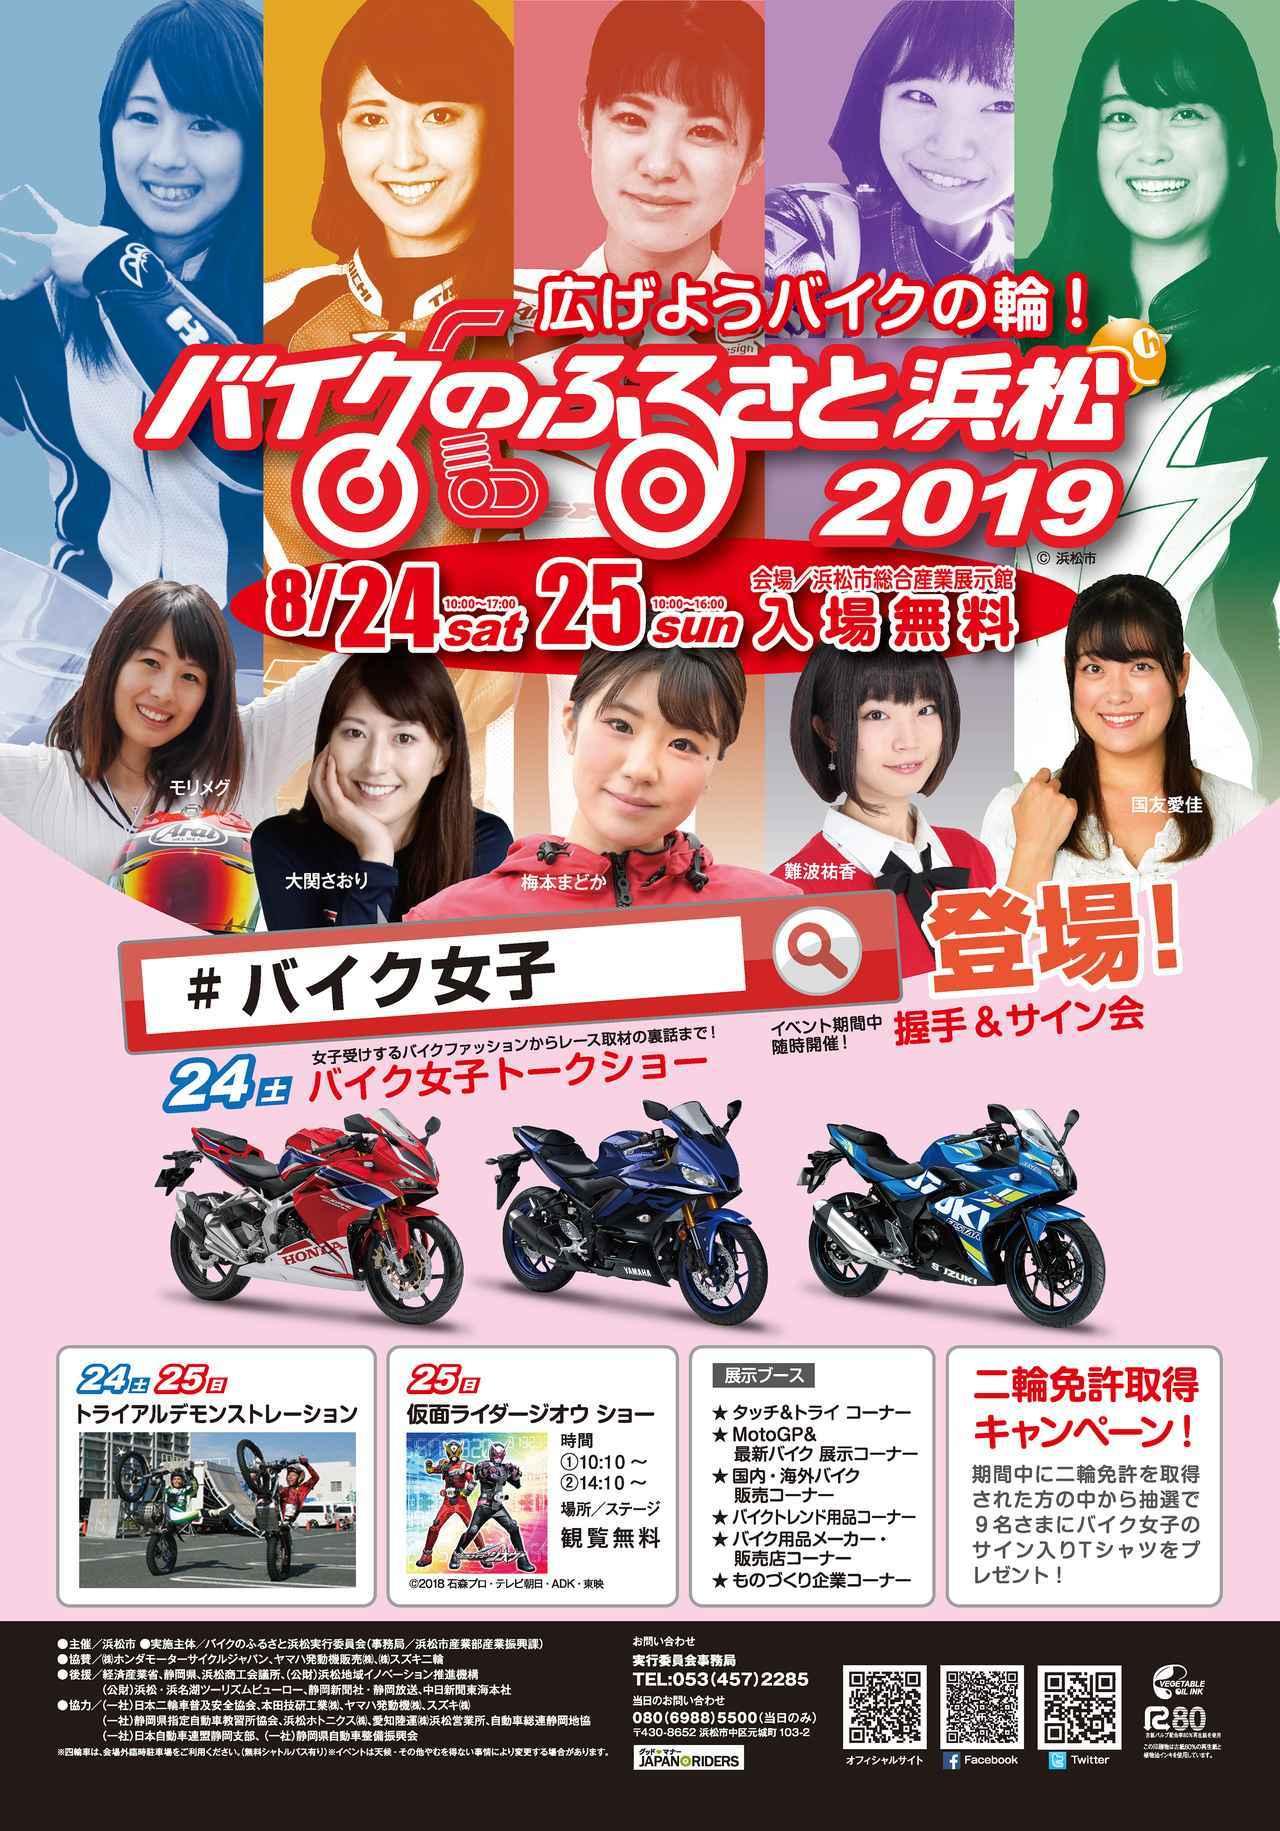 Images : 1番目の画像 - 「オートバイ女子部も参戦! 「バイクのふるさと浜松 2019」がいよいよ始まりました!」のアルバム - webオートバイ